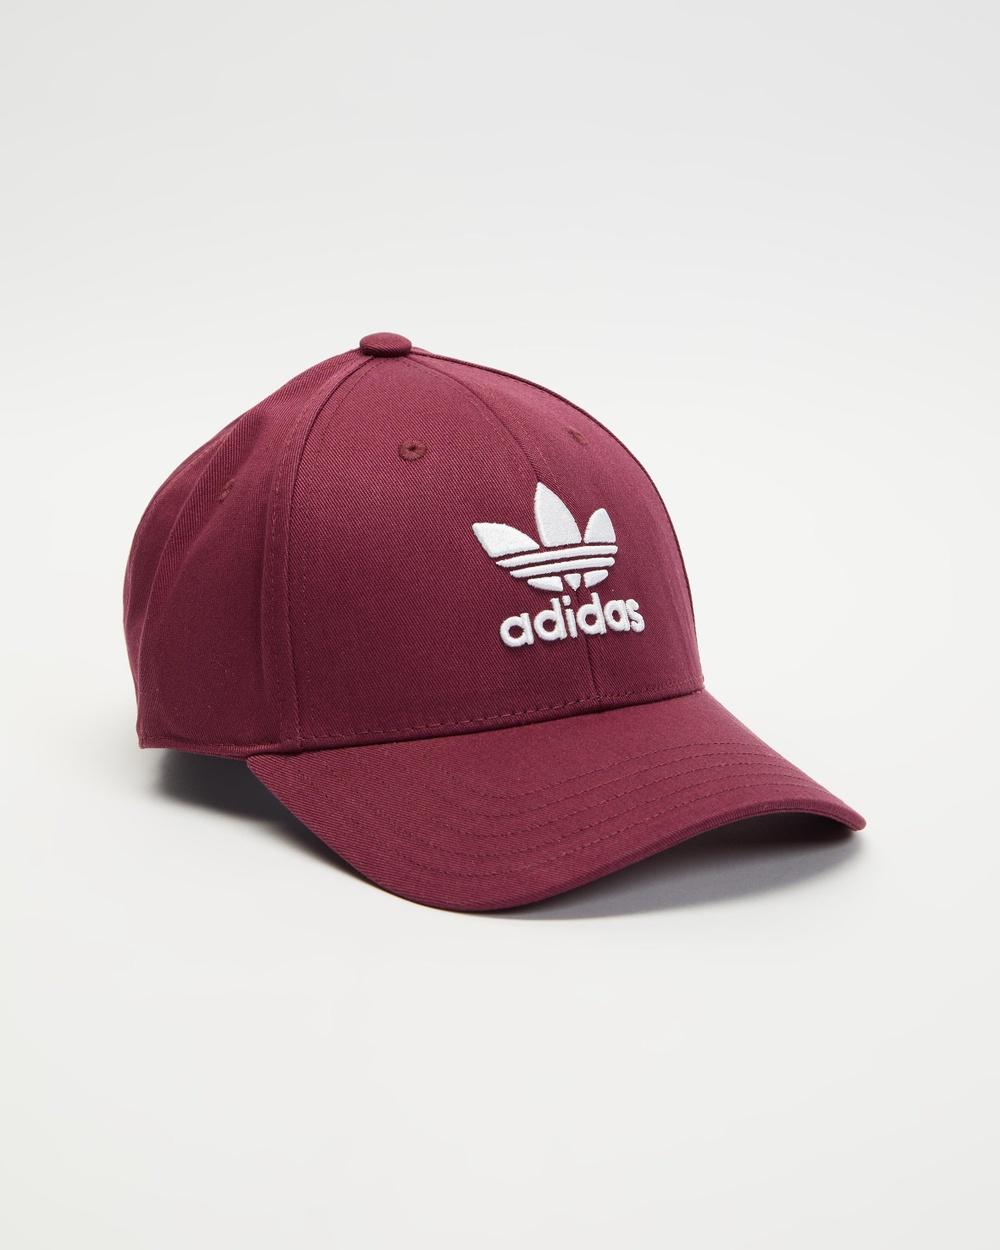 adidas Originals Trefoil Baseball Cap Headwear Victory Crimson